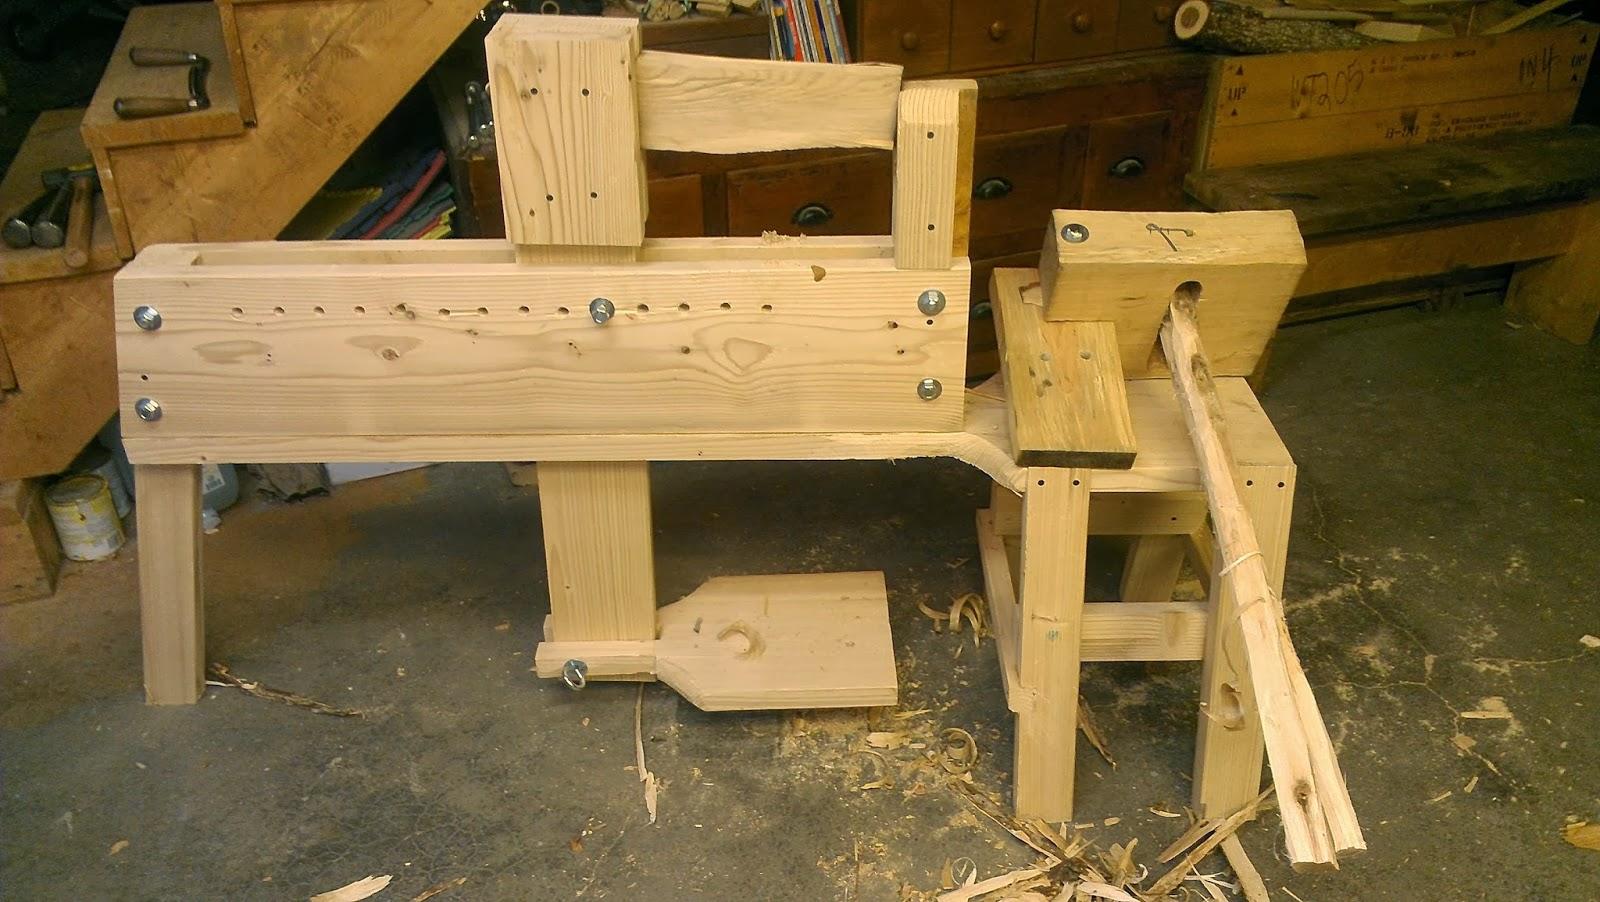 Eric goodson woodcarving notes presto chango